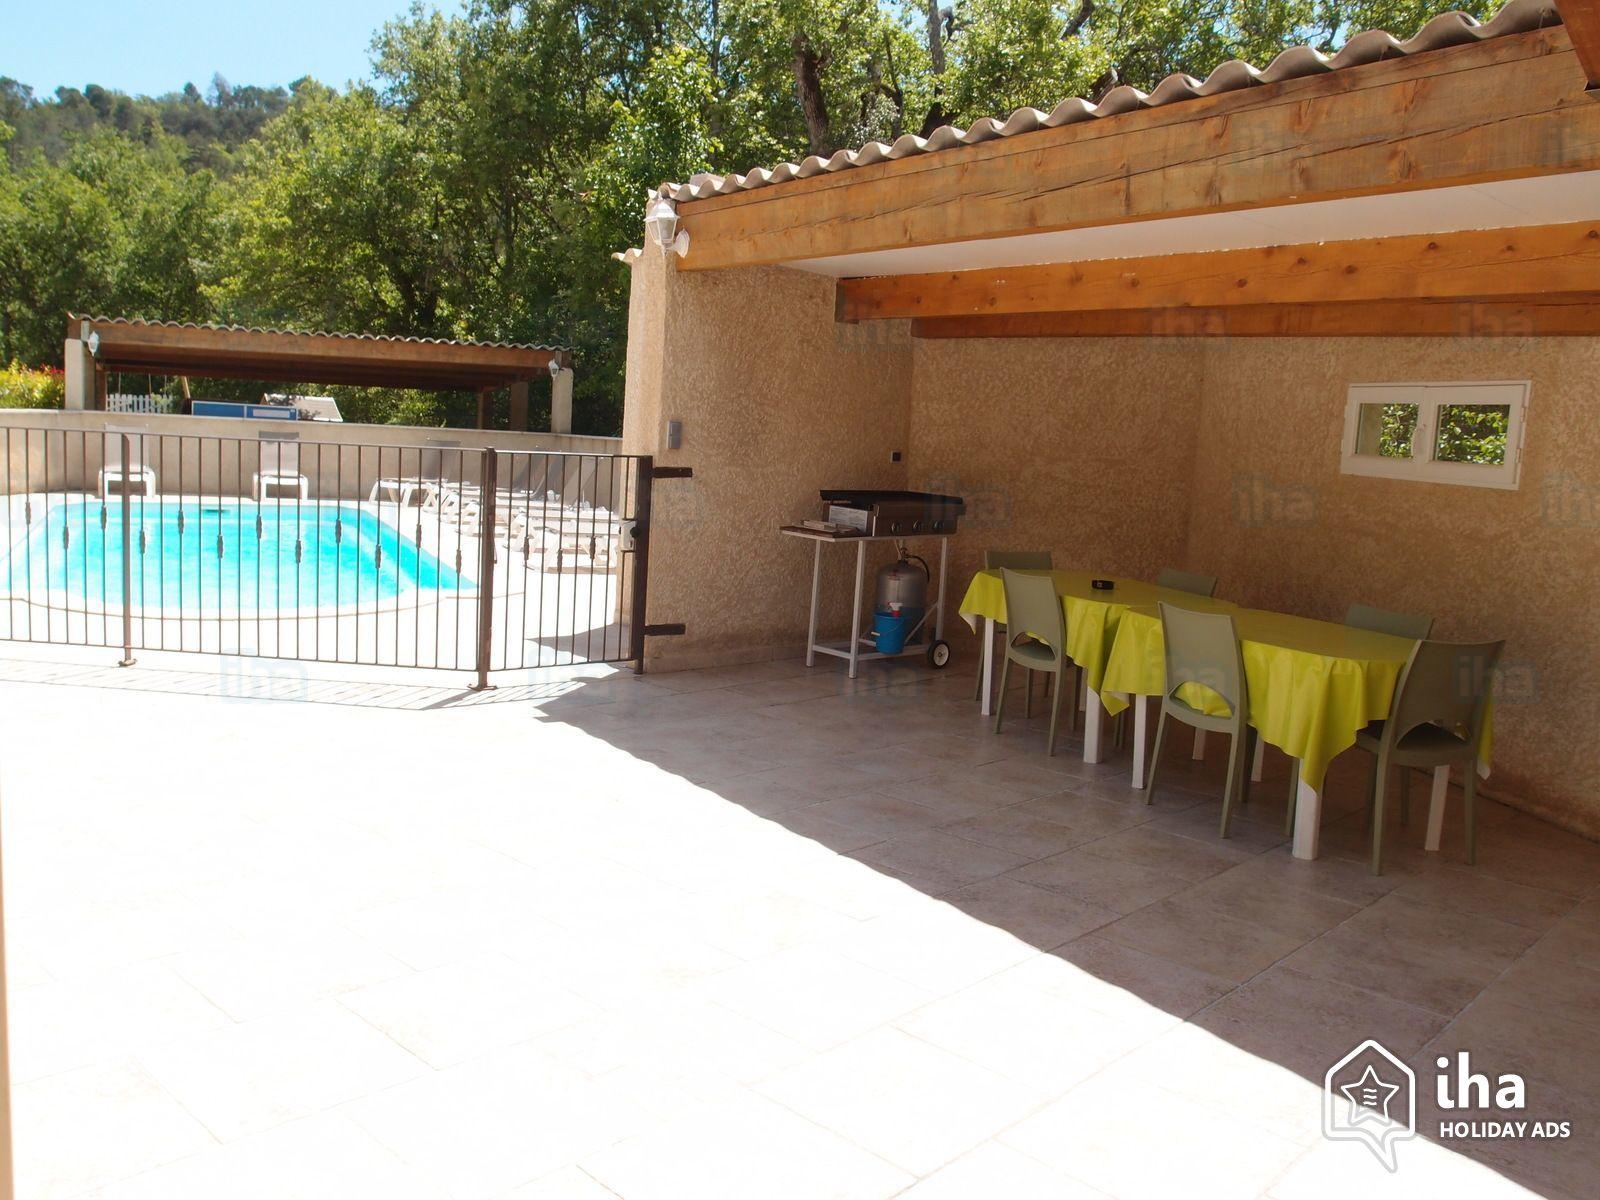 4 Bedrooms Villa For Rent From 2 To 10 People avec Cash Piscine Manosque